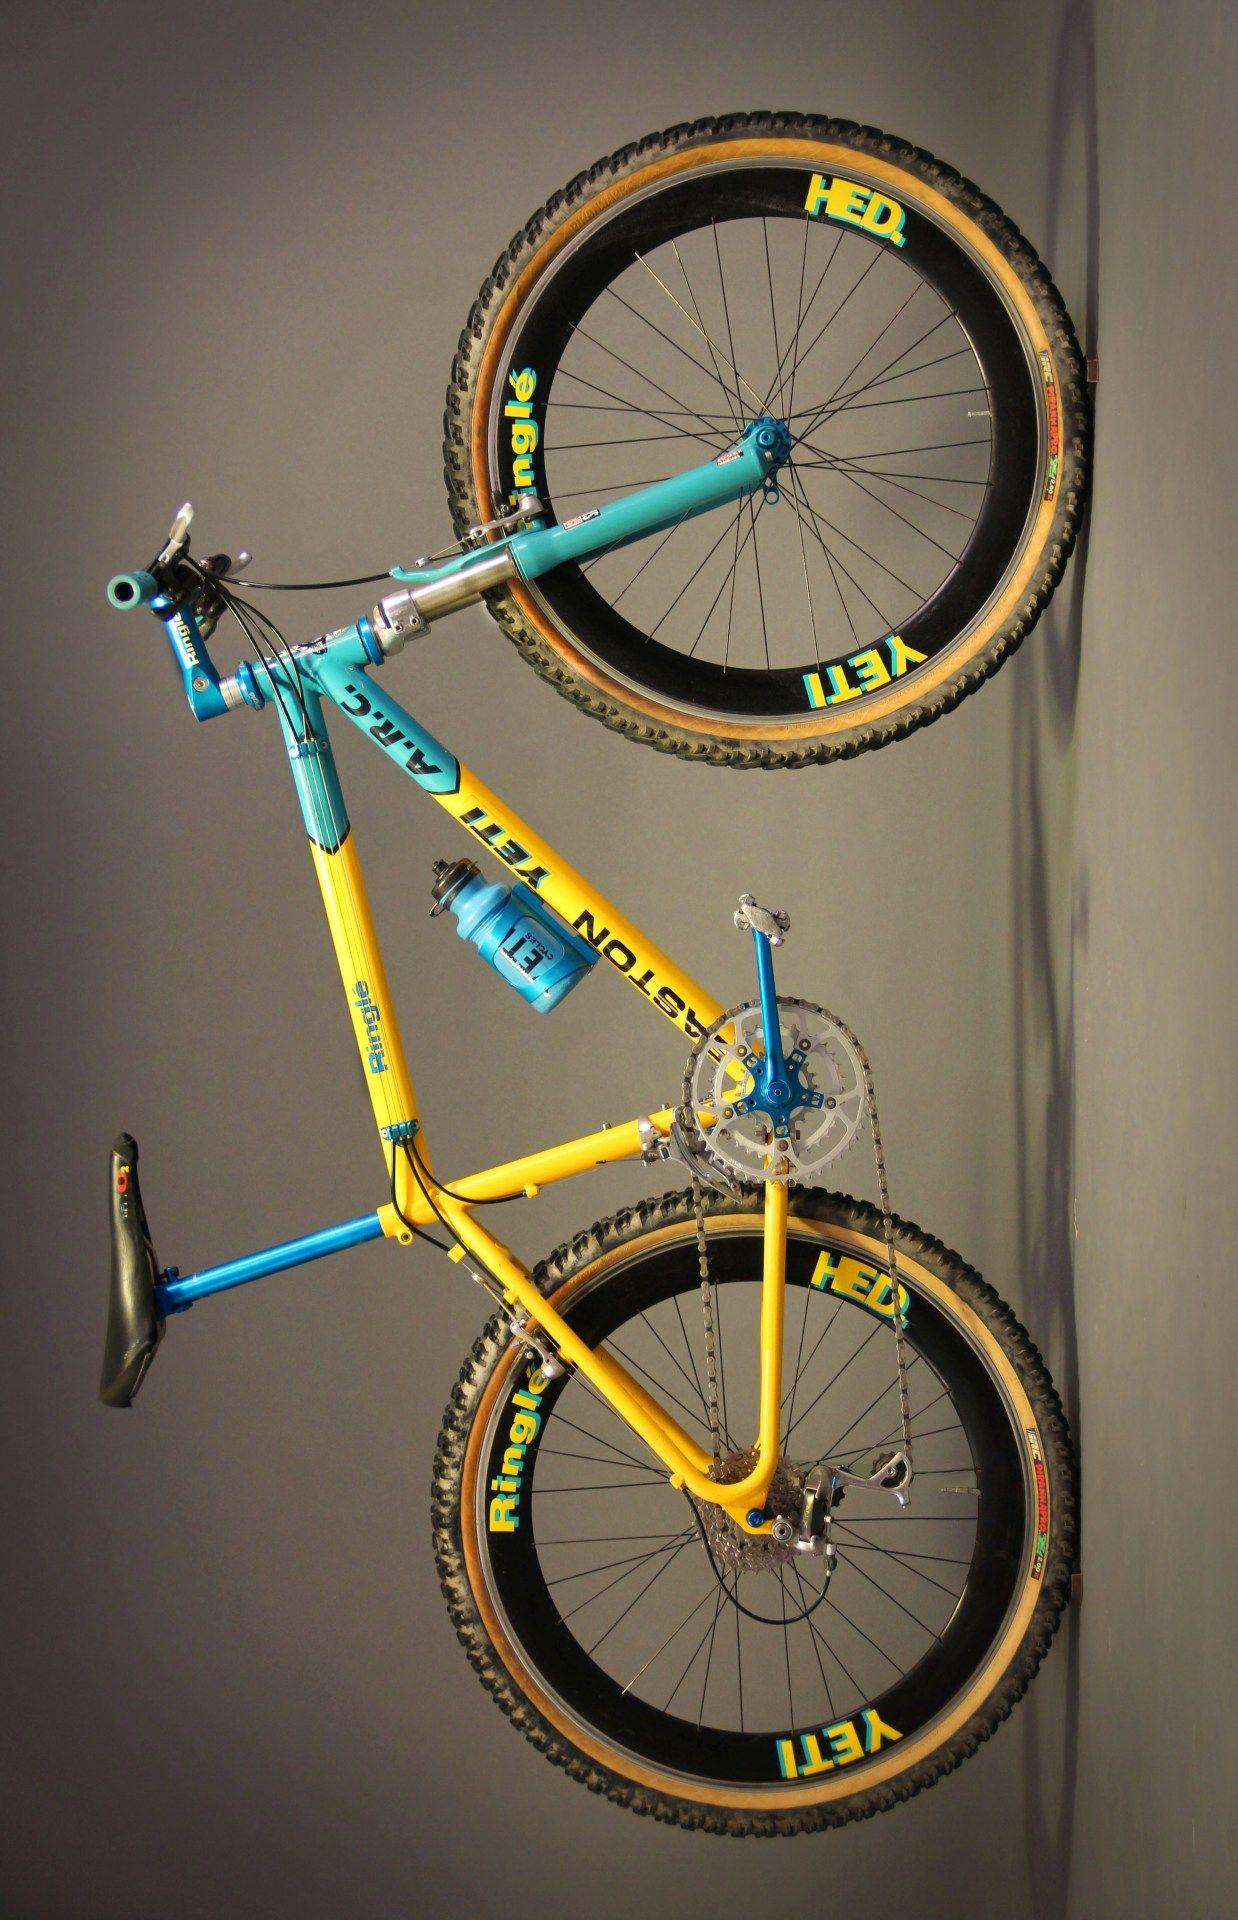 Bikeplanet Bikeporn From The 90s Yeti Arc Vintage Mountain Bike Yeti Bikes Bike Riding Benefits